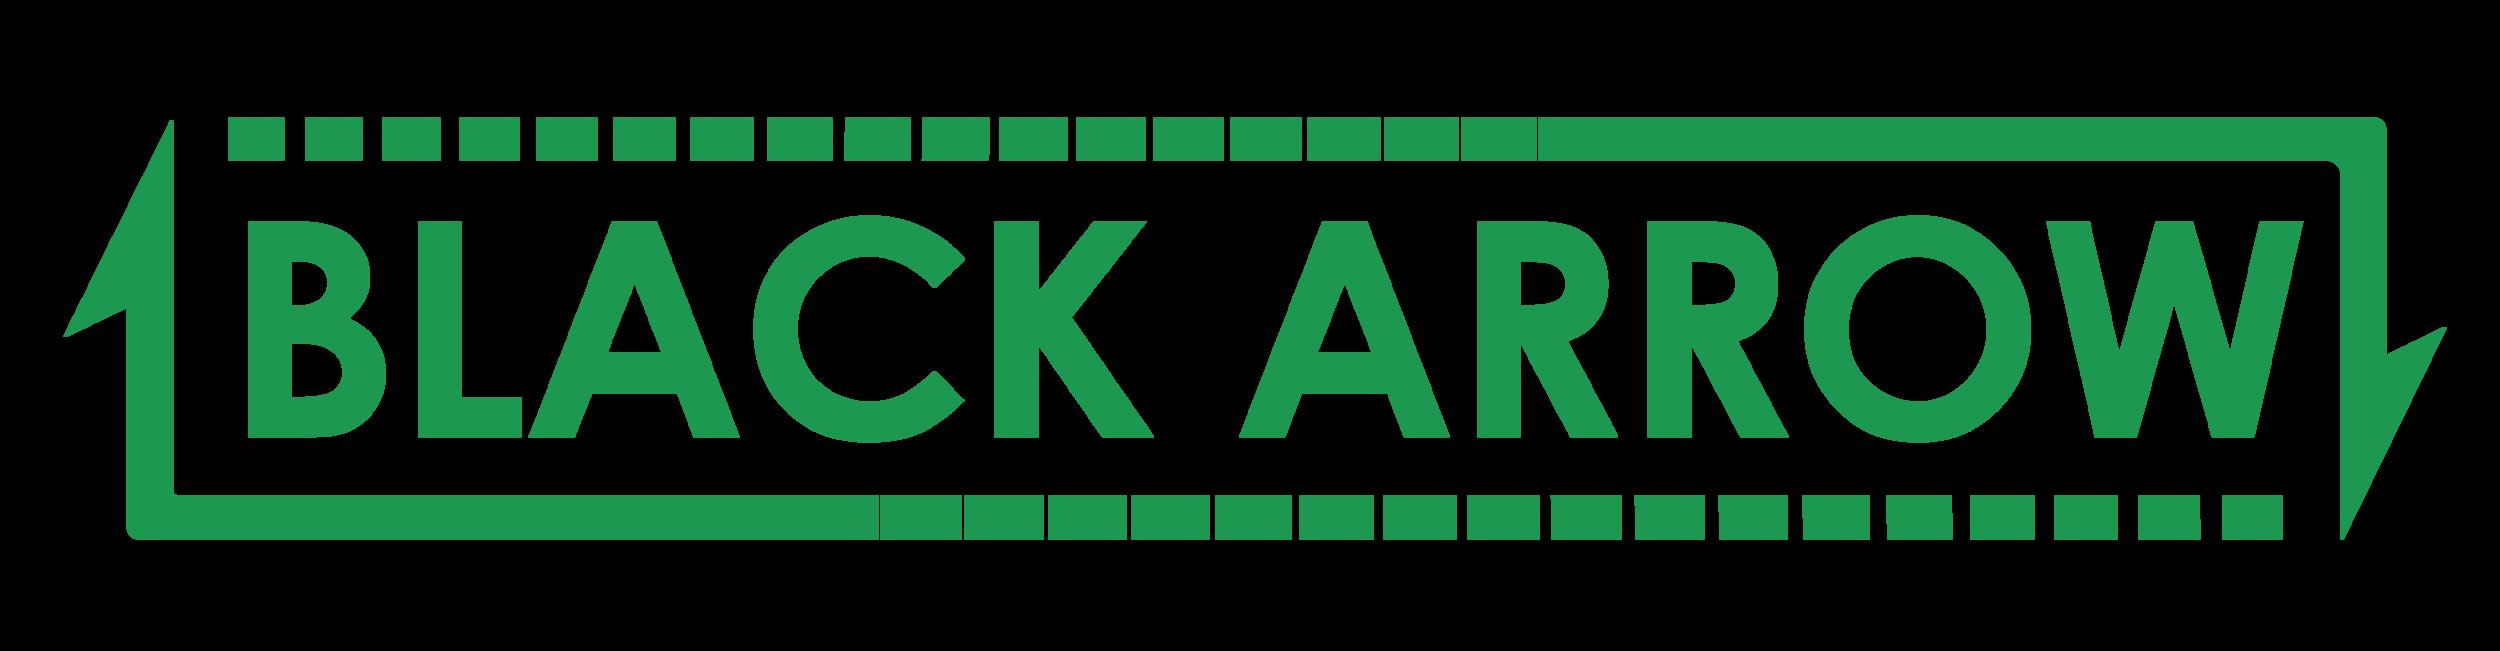 BlackArrow-Long-Green-01 (8).png